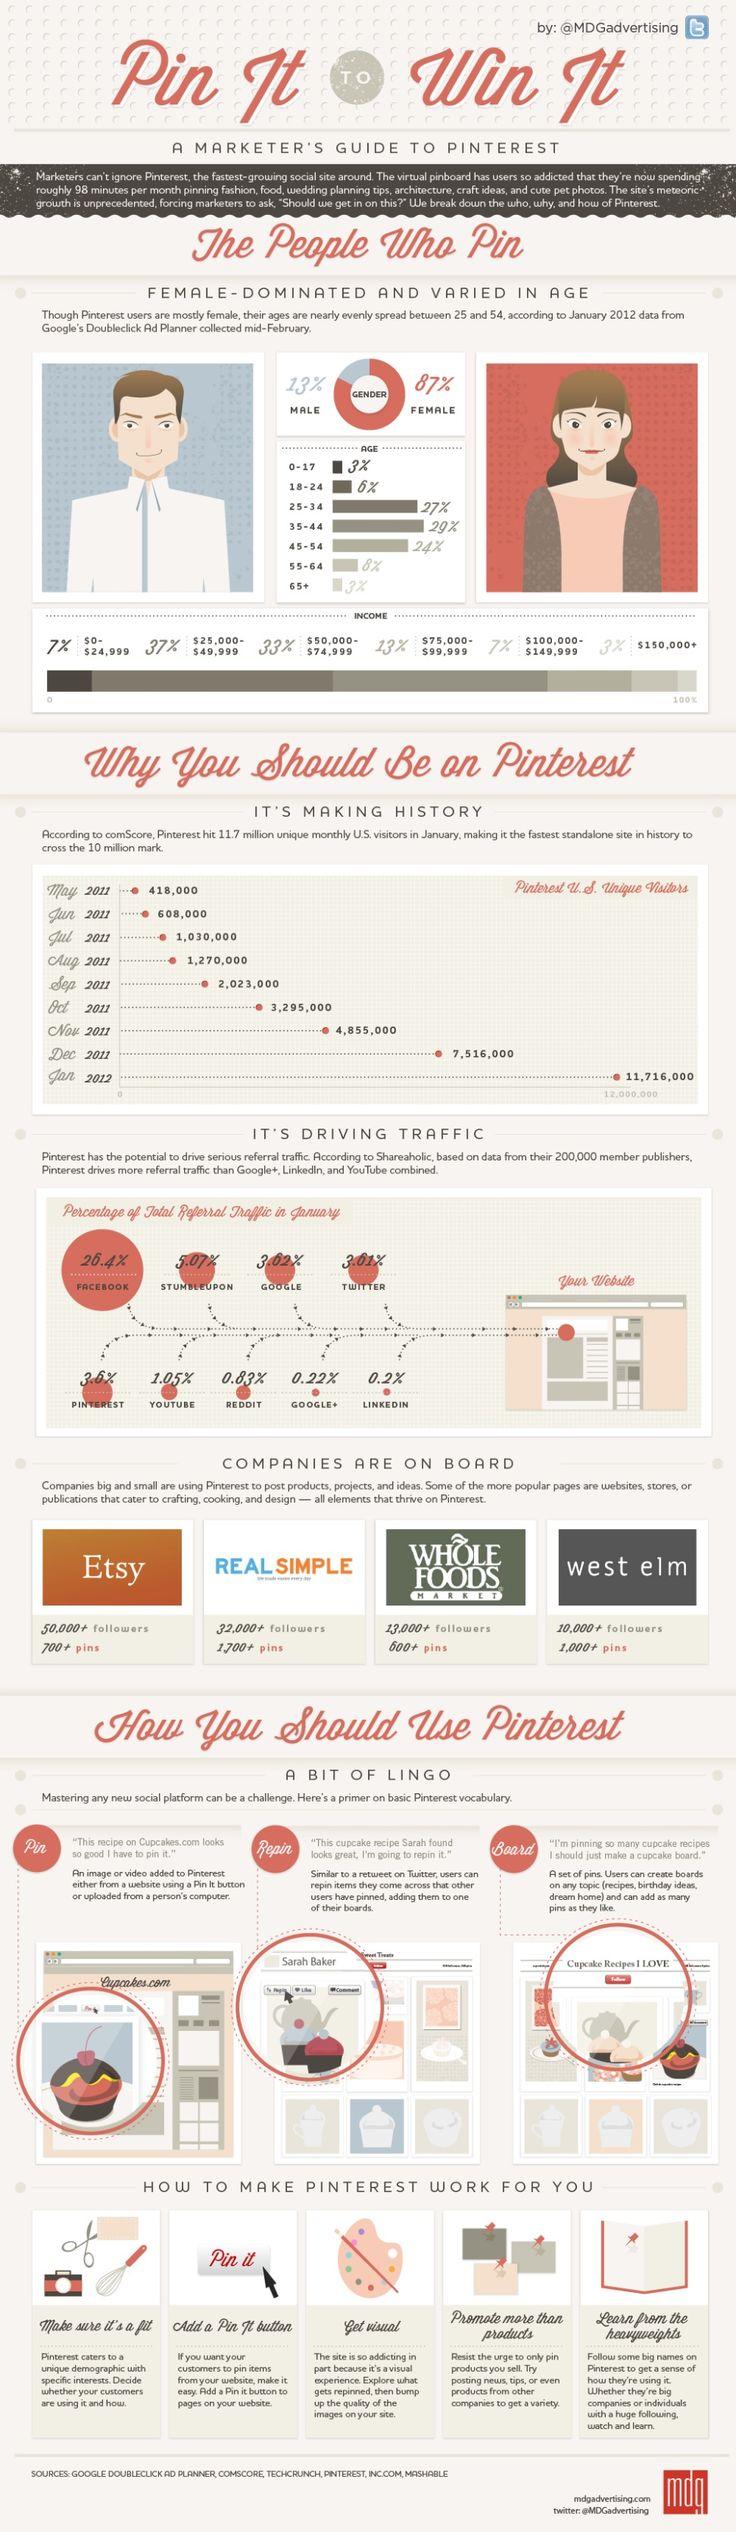 The Marketer's Guide to Pinterest cc. @Marissa Morales CoelloInternet Marketing, Pin Boards, Guide To, Marketing Guide, Social Media, The Social Network, Pinterest Infographic, Socialmedia, Design